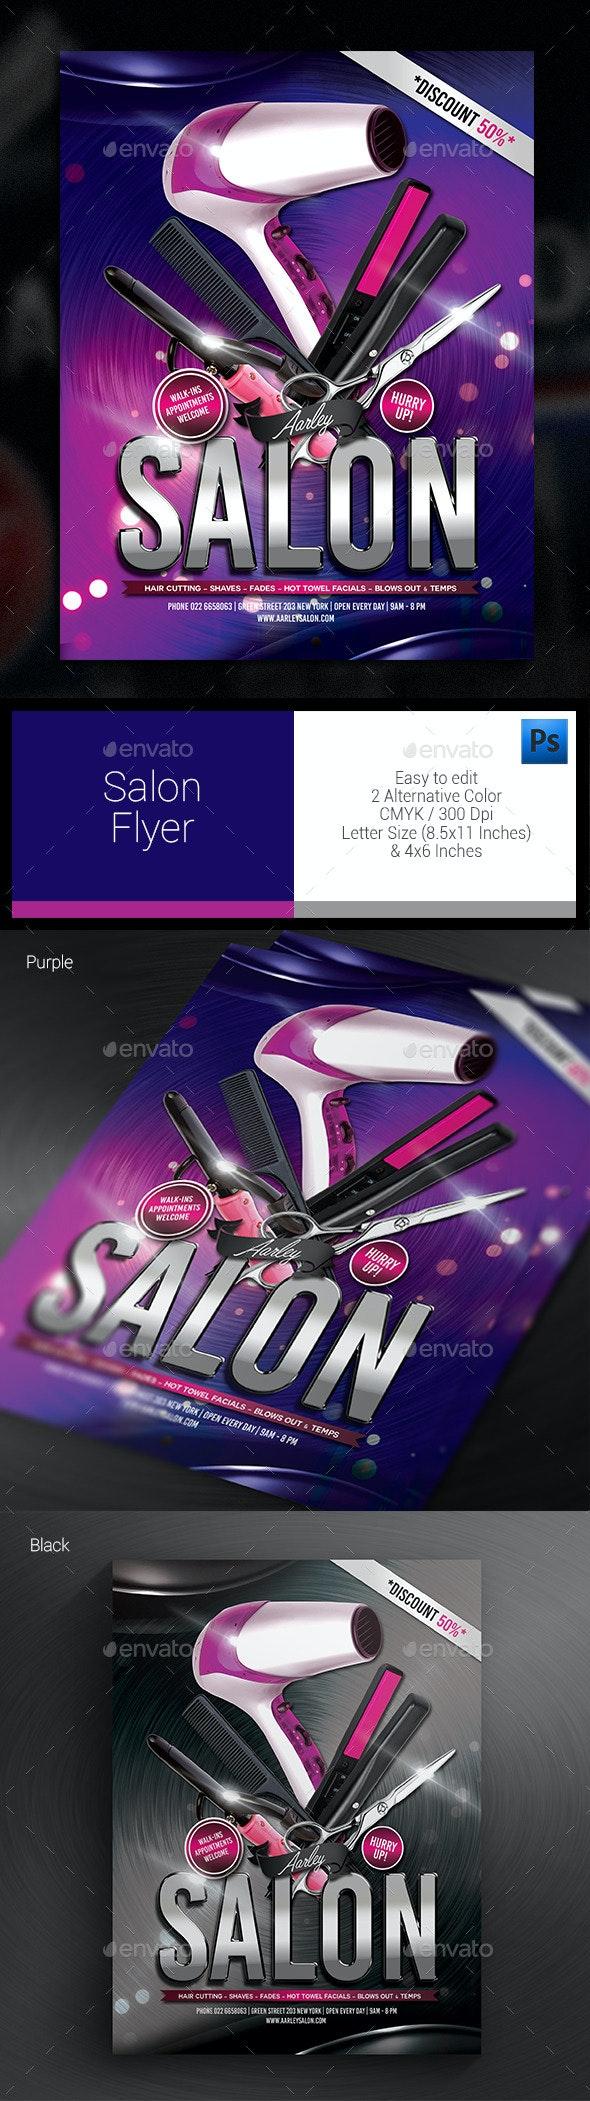 Salon Flyer - Corporate Flyers